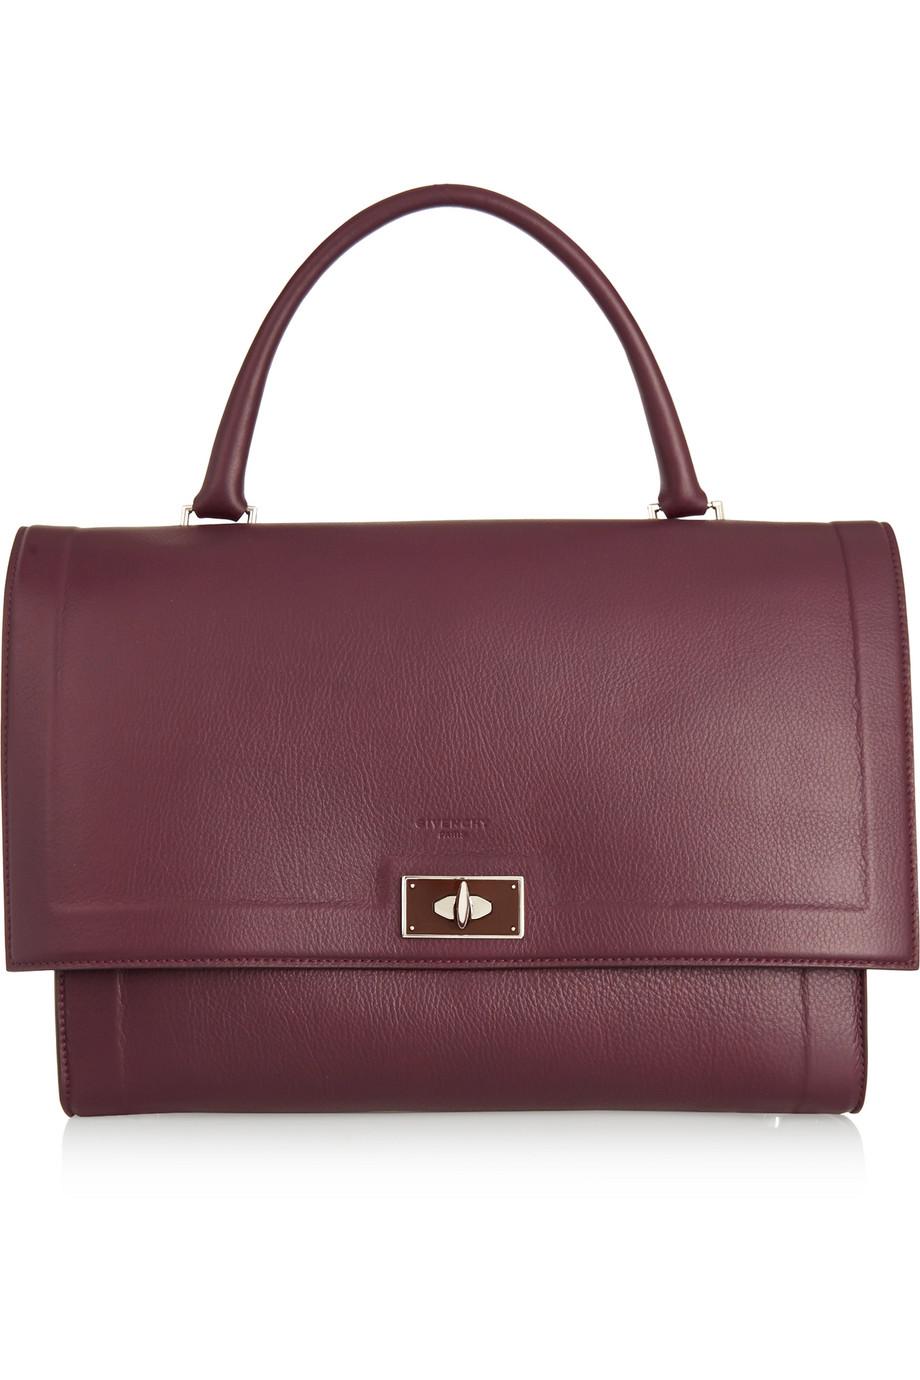 Givenchy Medium Shark Bag in Burgundy Textured-Leather, Women's